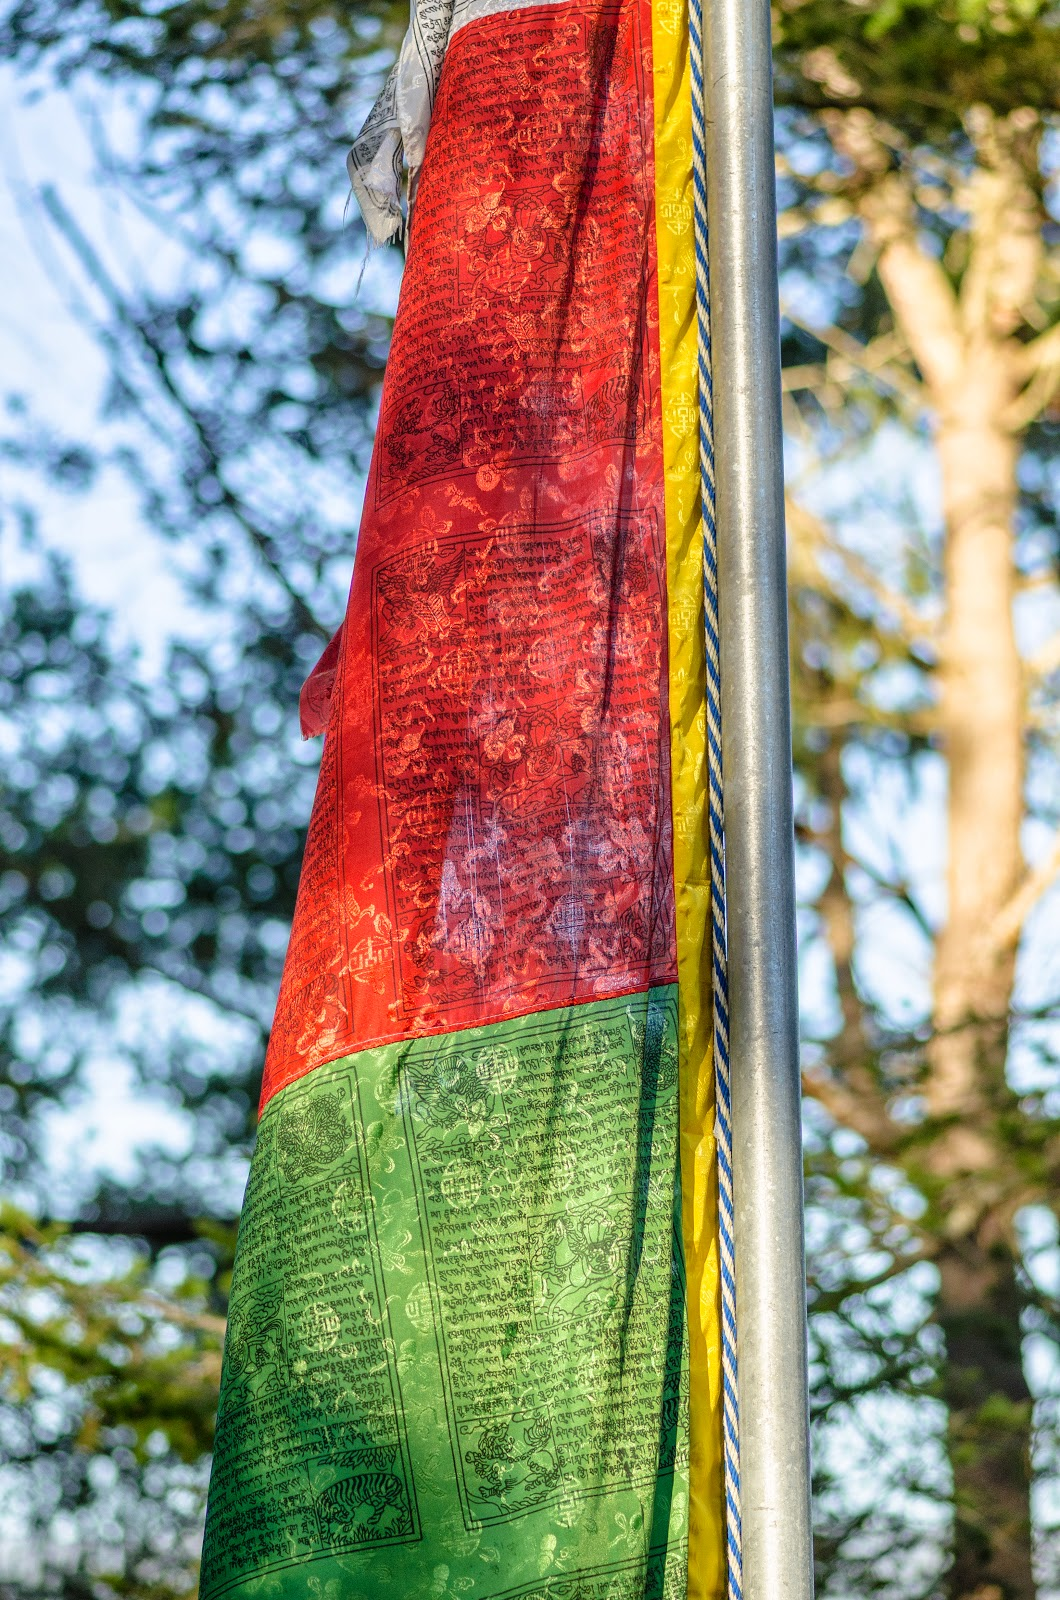 Prayer flag at Kachoe Dechen Ling. Photo by Chris Majors.